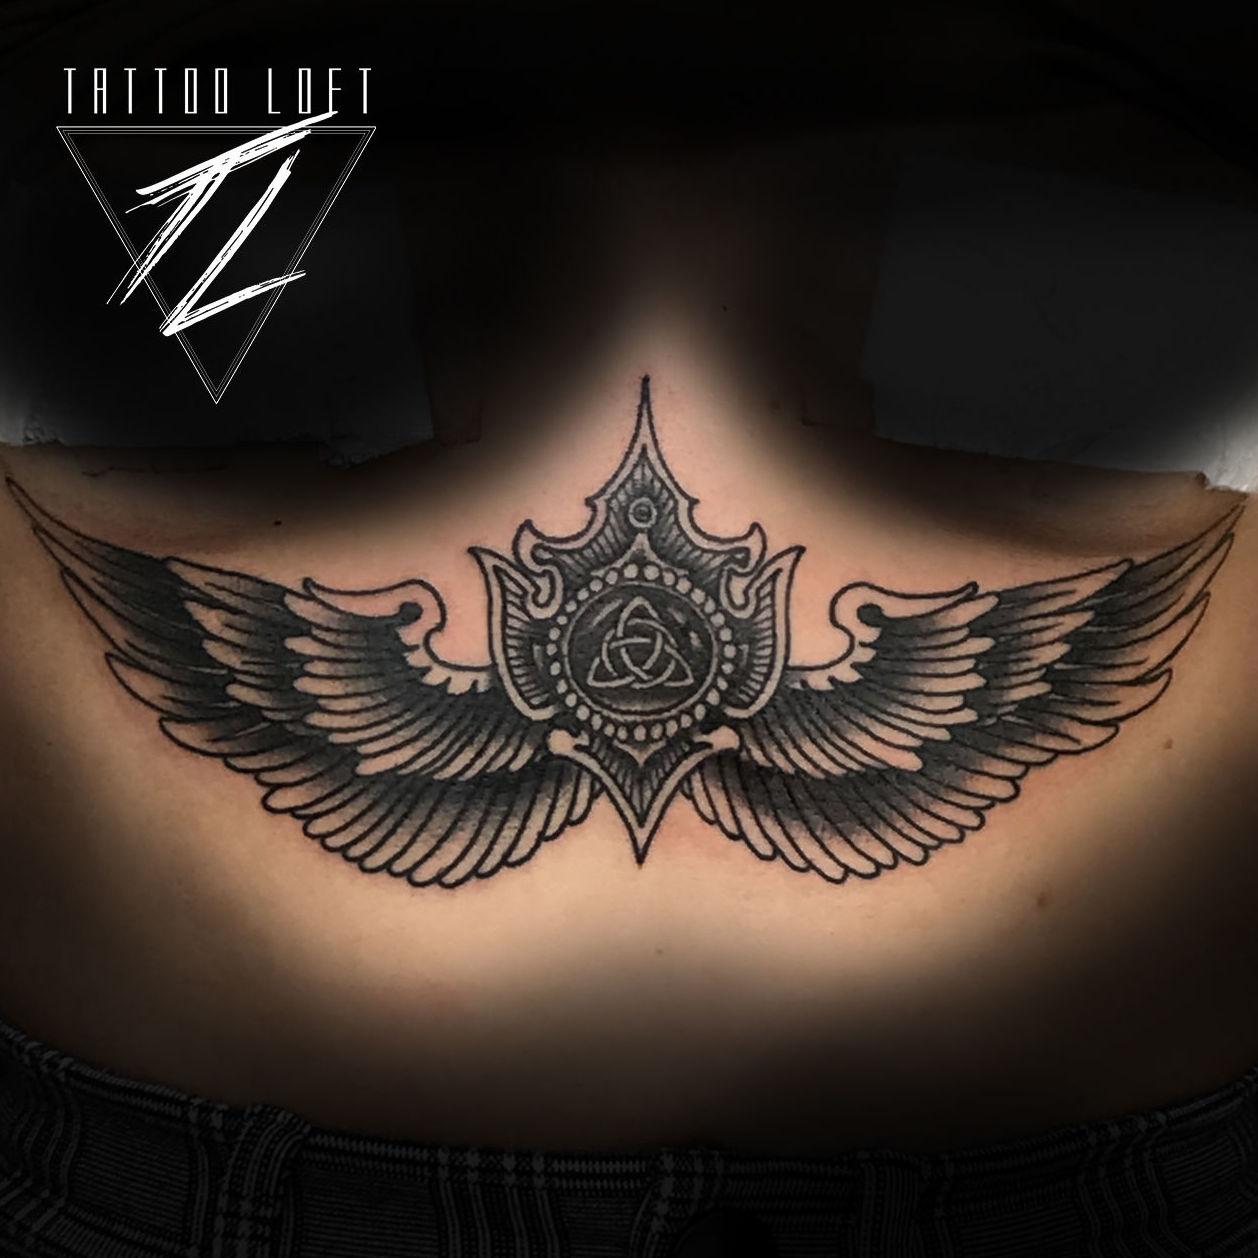 Foto 3 de Estudio artístico de tatuaje en  | Tattoo Loft